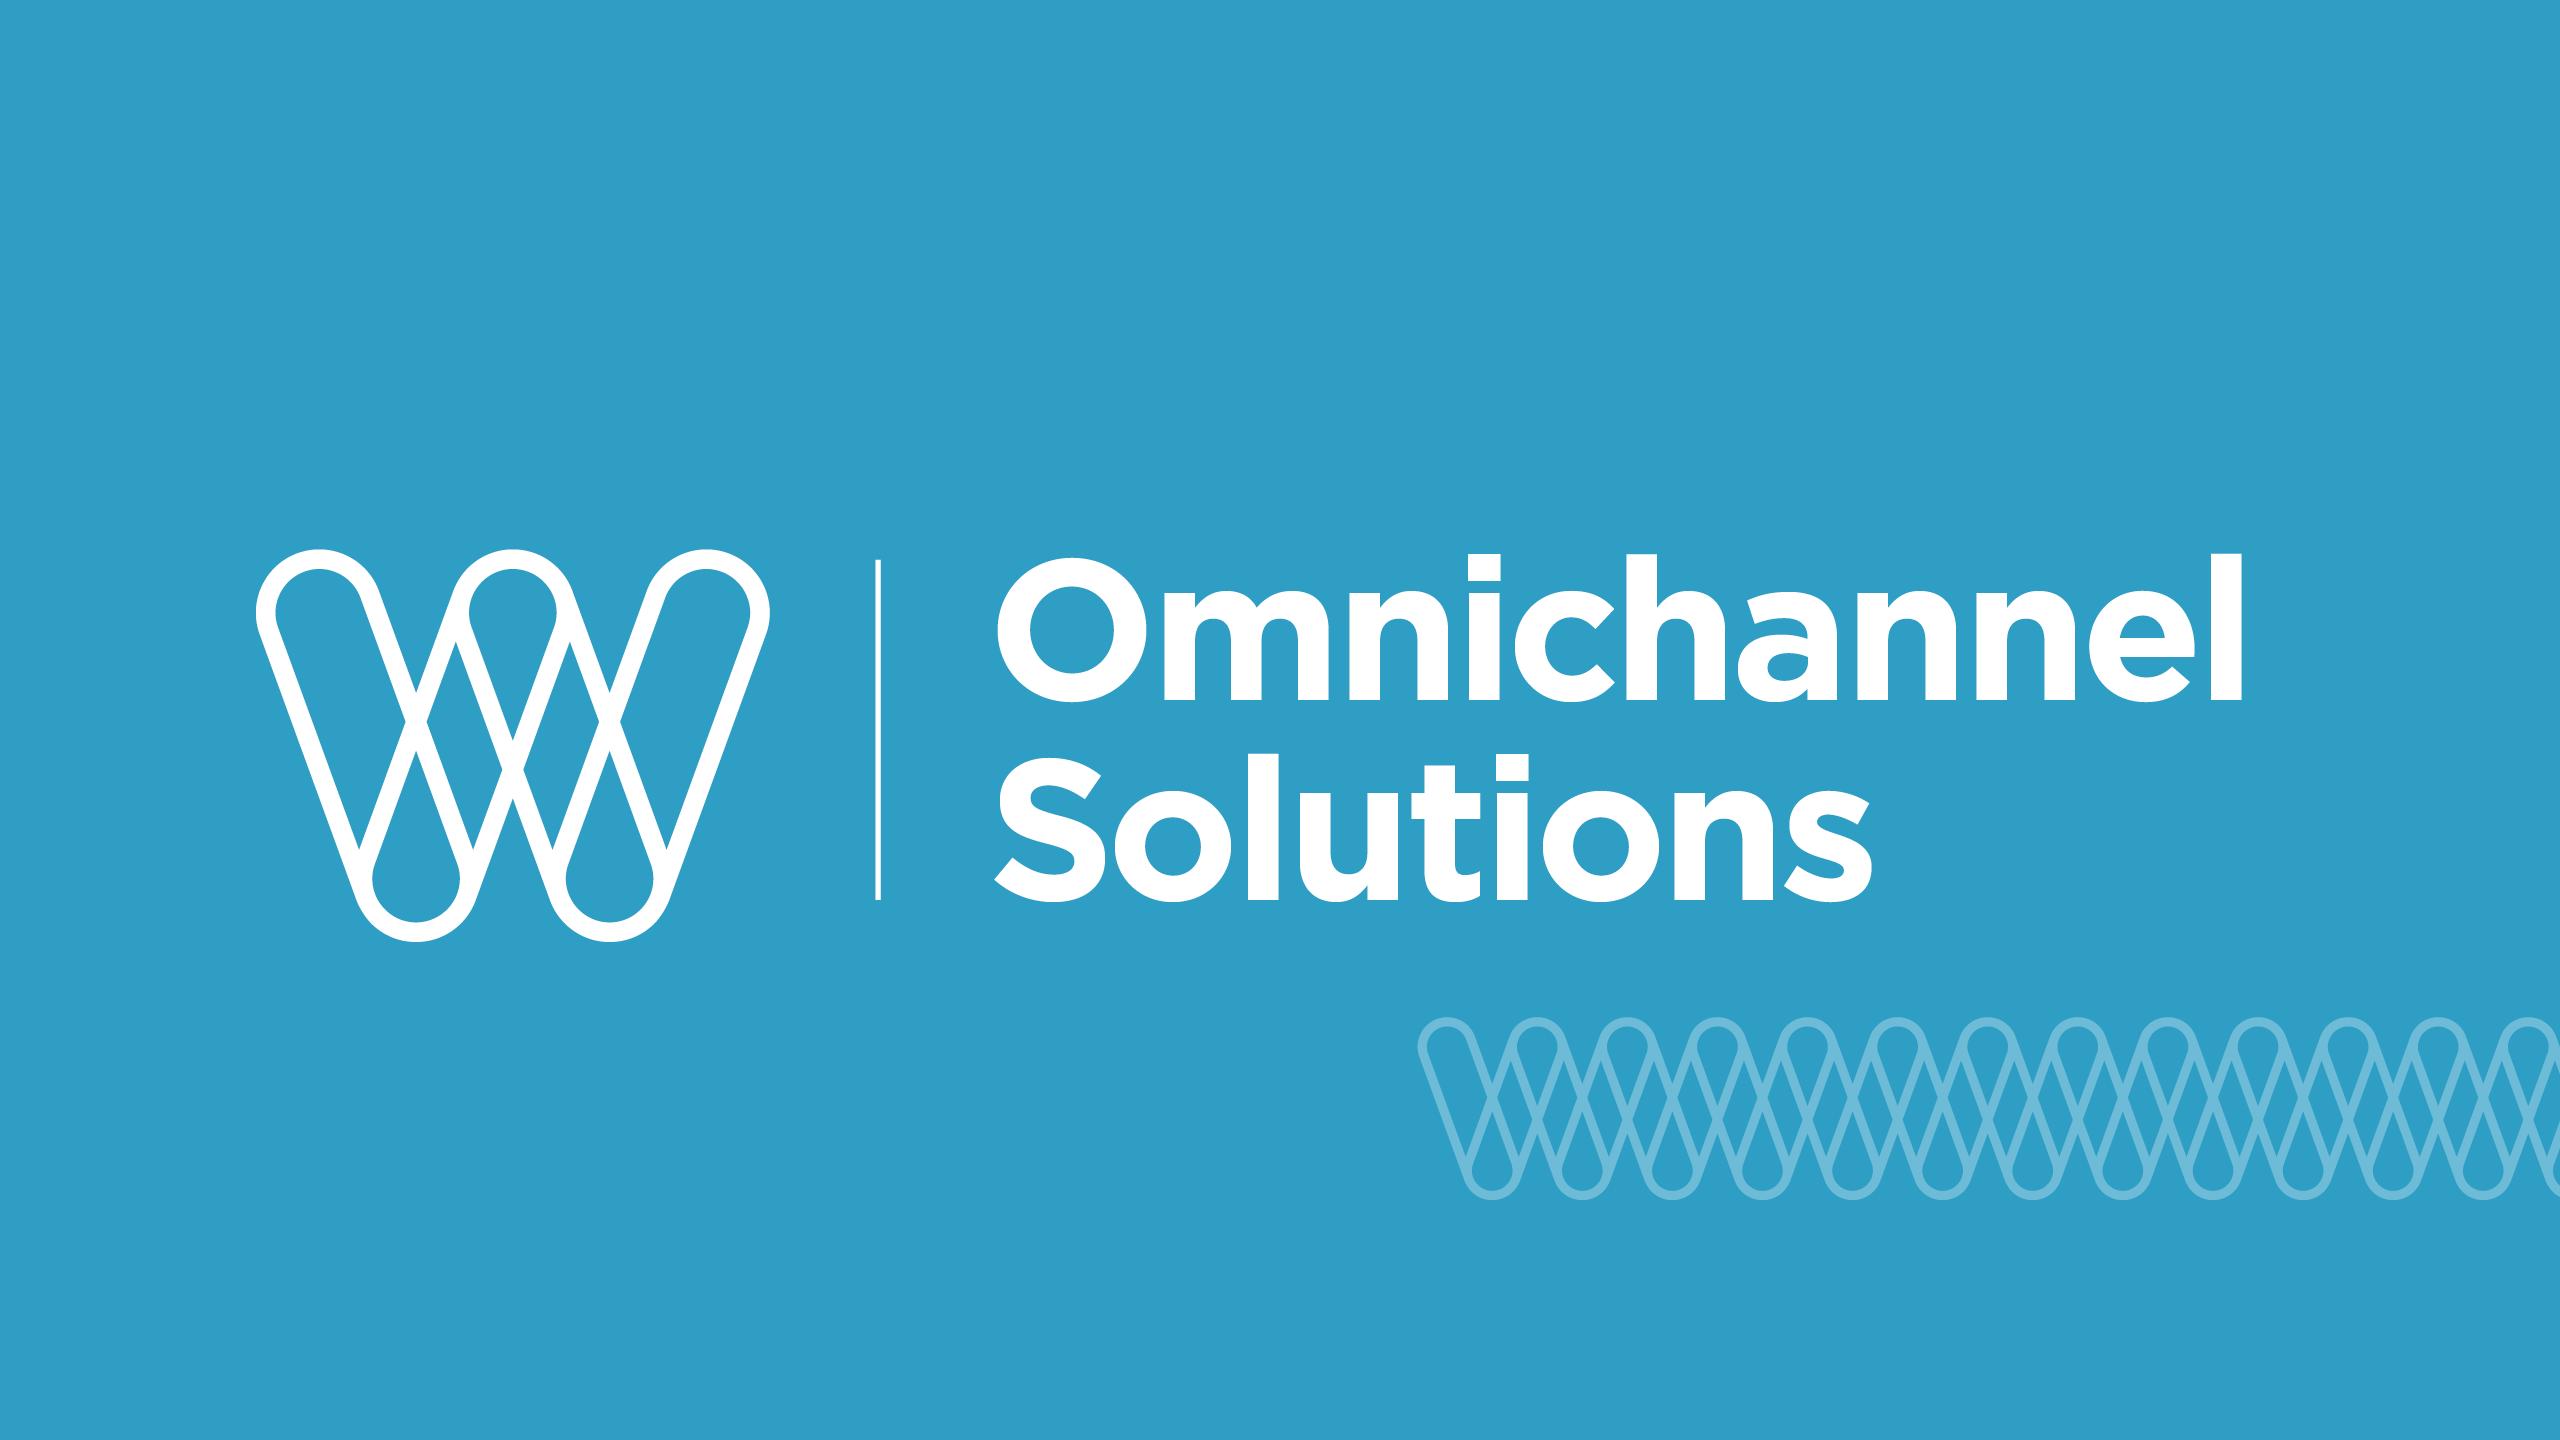 omnichannel solutions